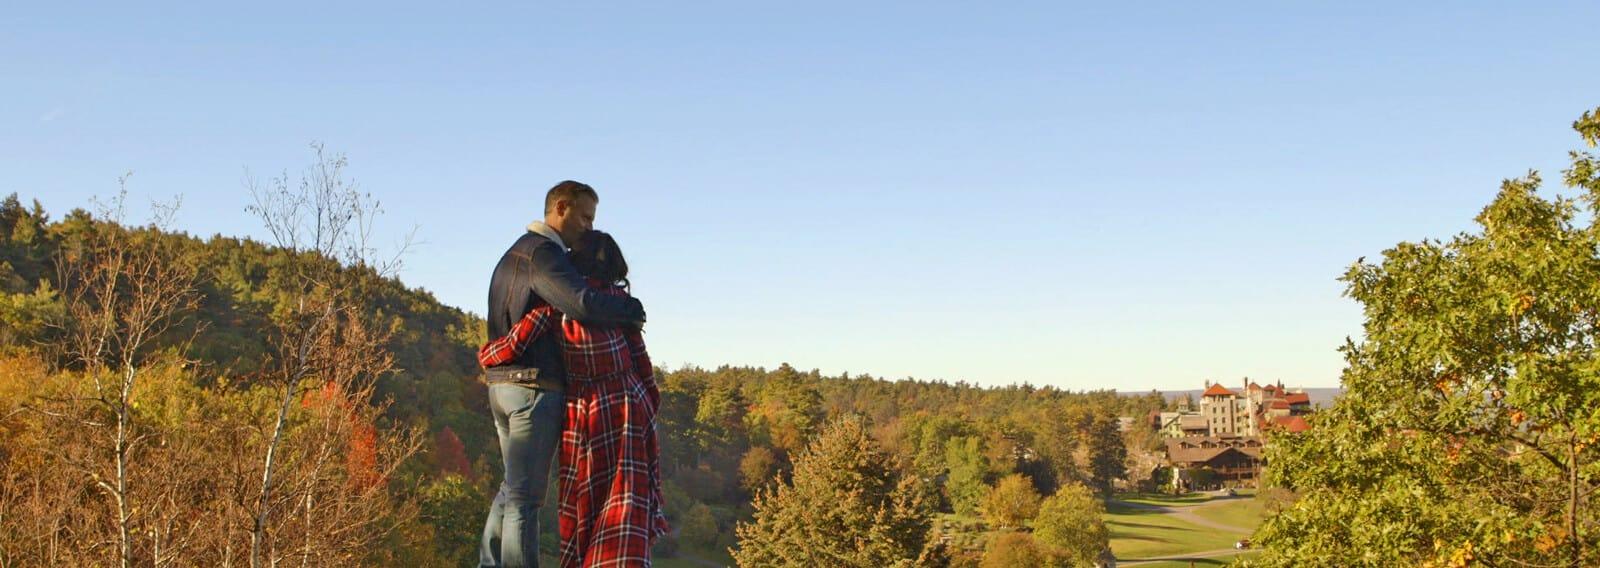 Couple's Fall Romantic Getaway